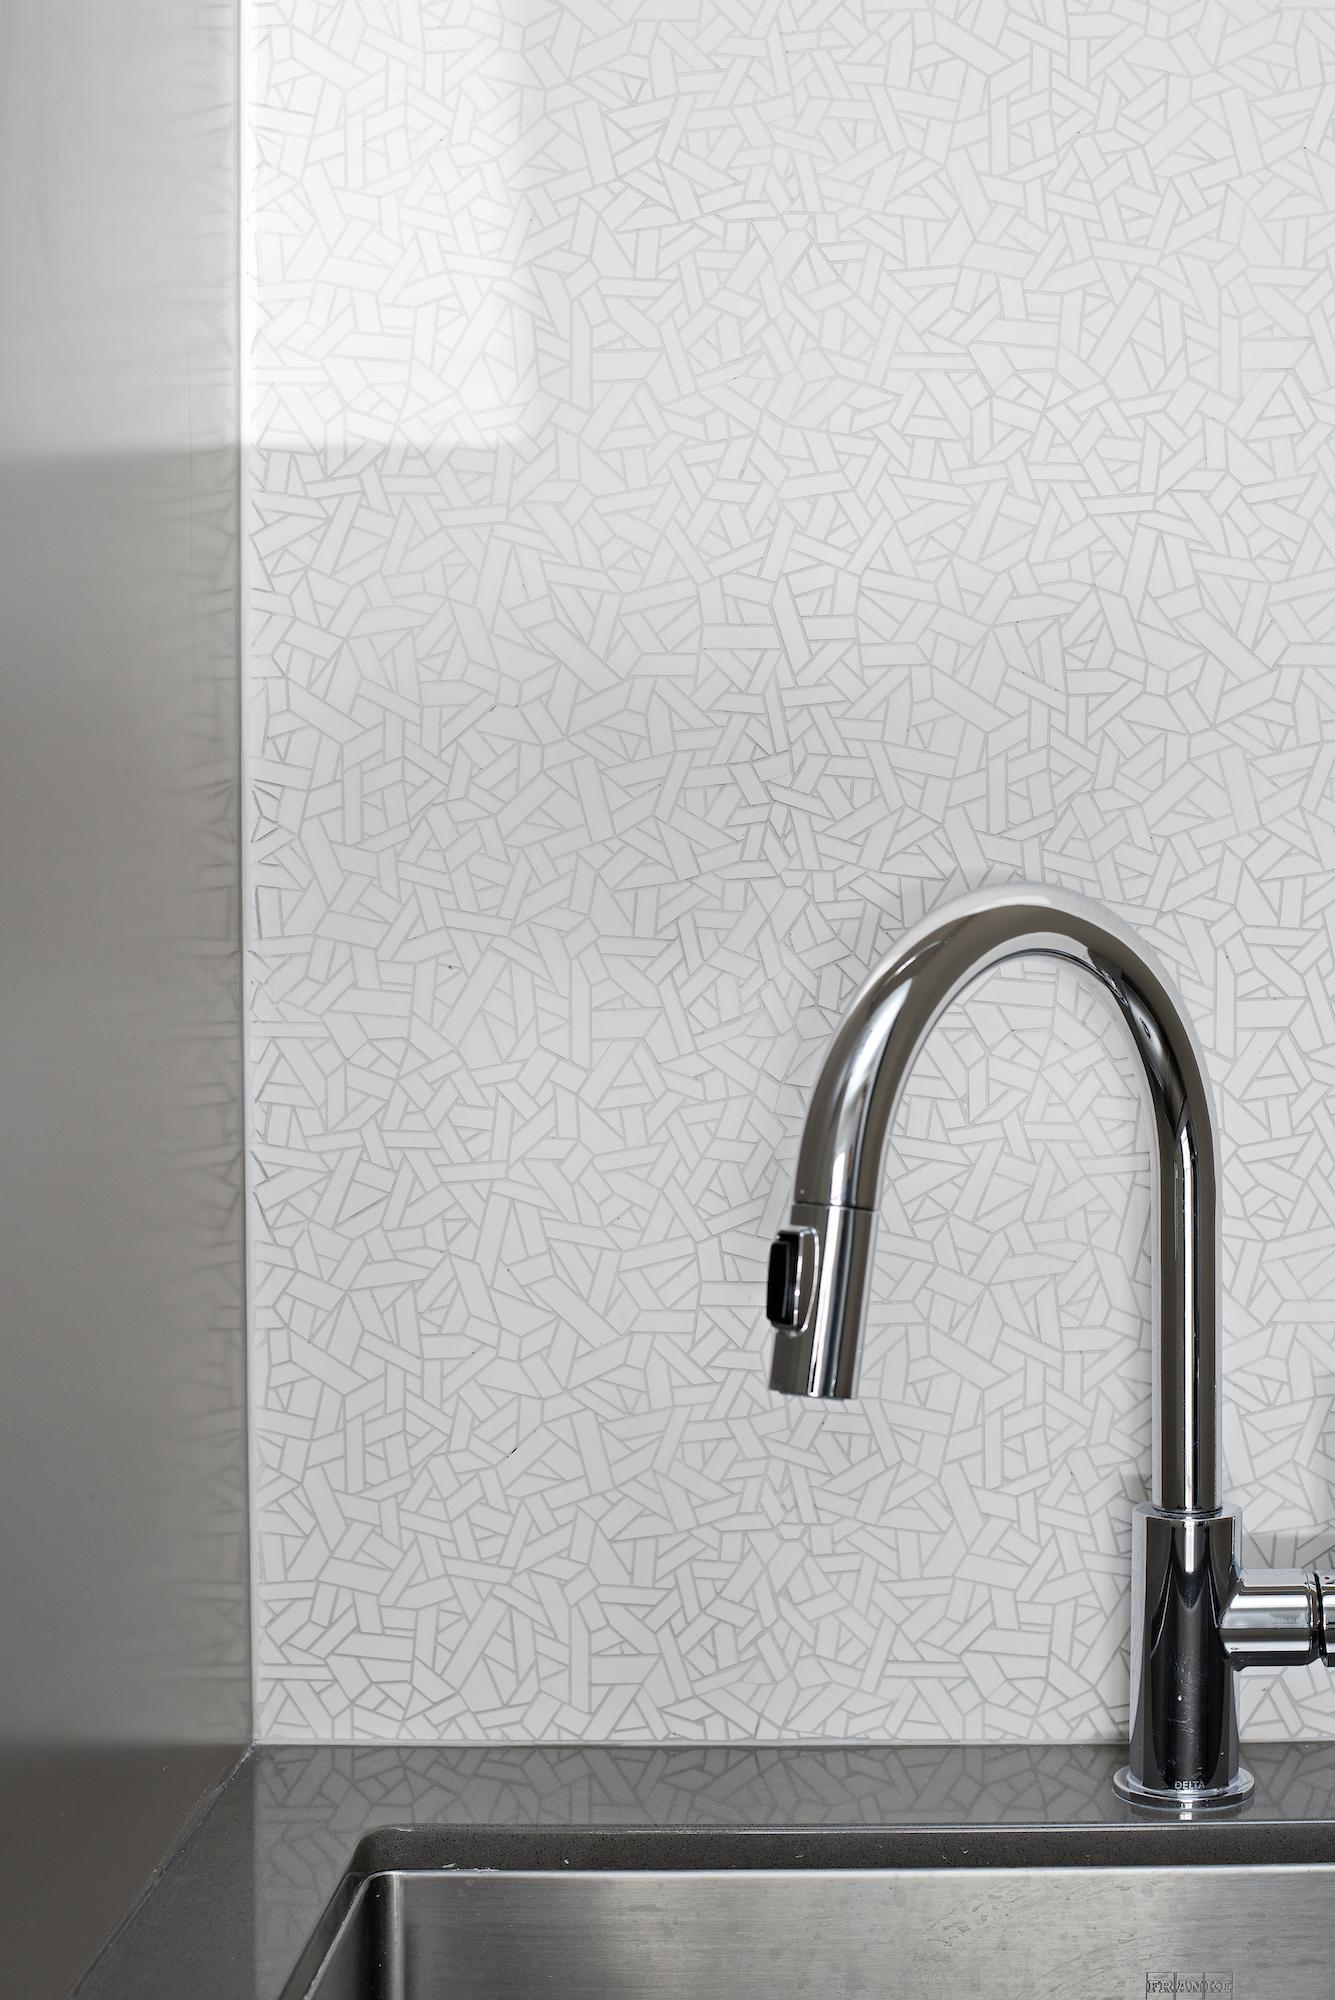 Laundry Room Faucet.jpg